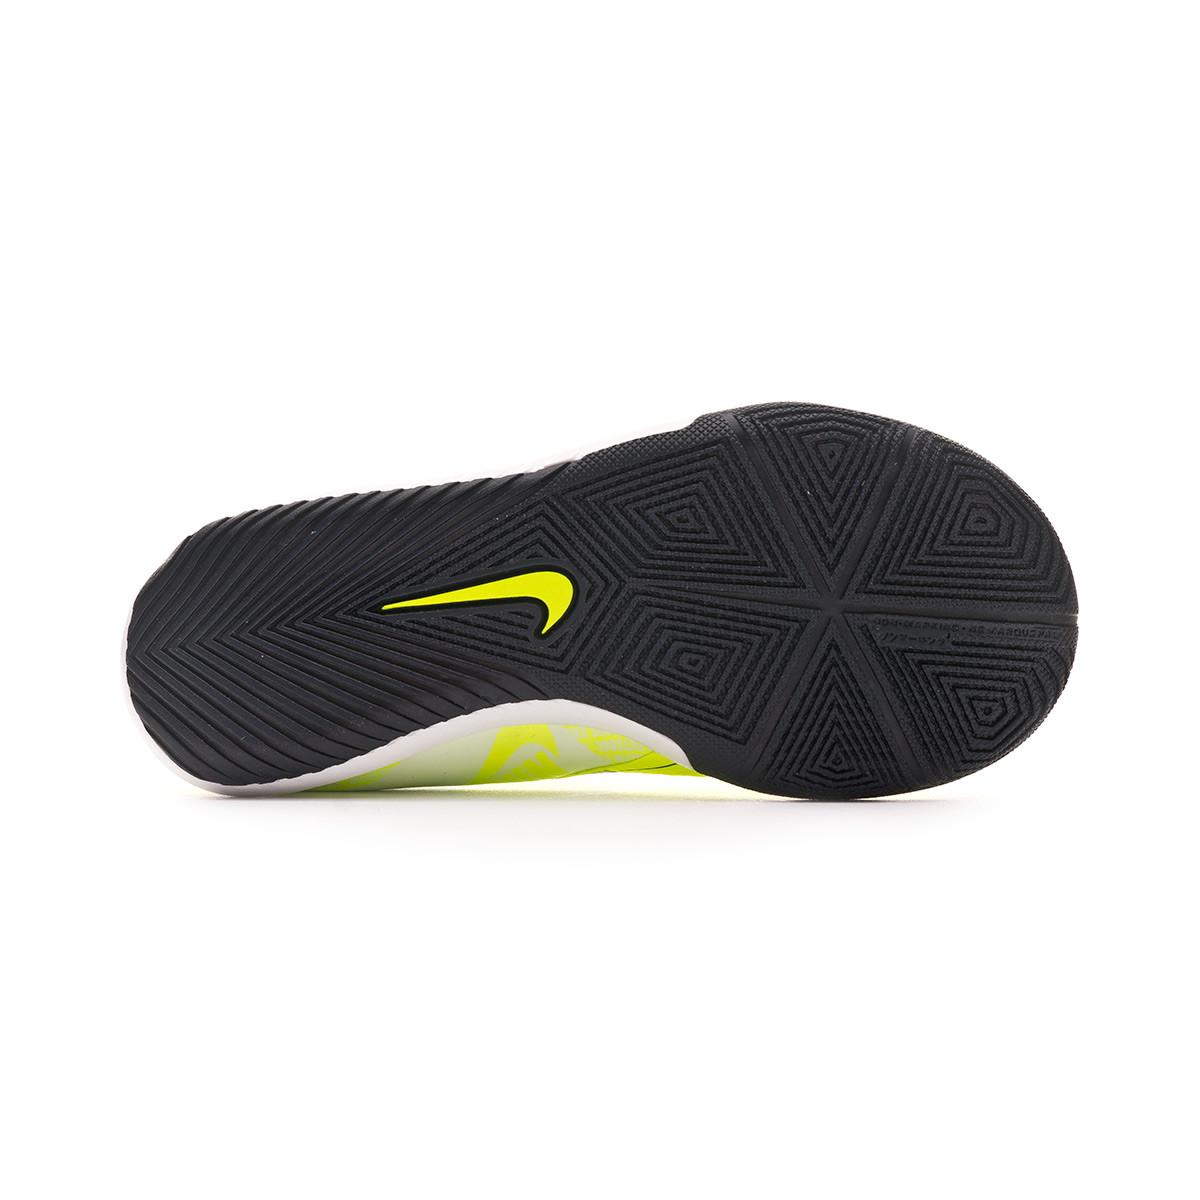 Scarpe Nike Phantom Venom Academy IC Volt Obsidian Negozio